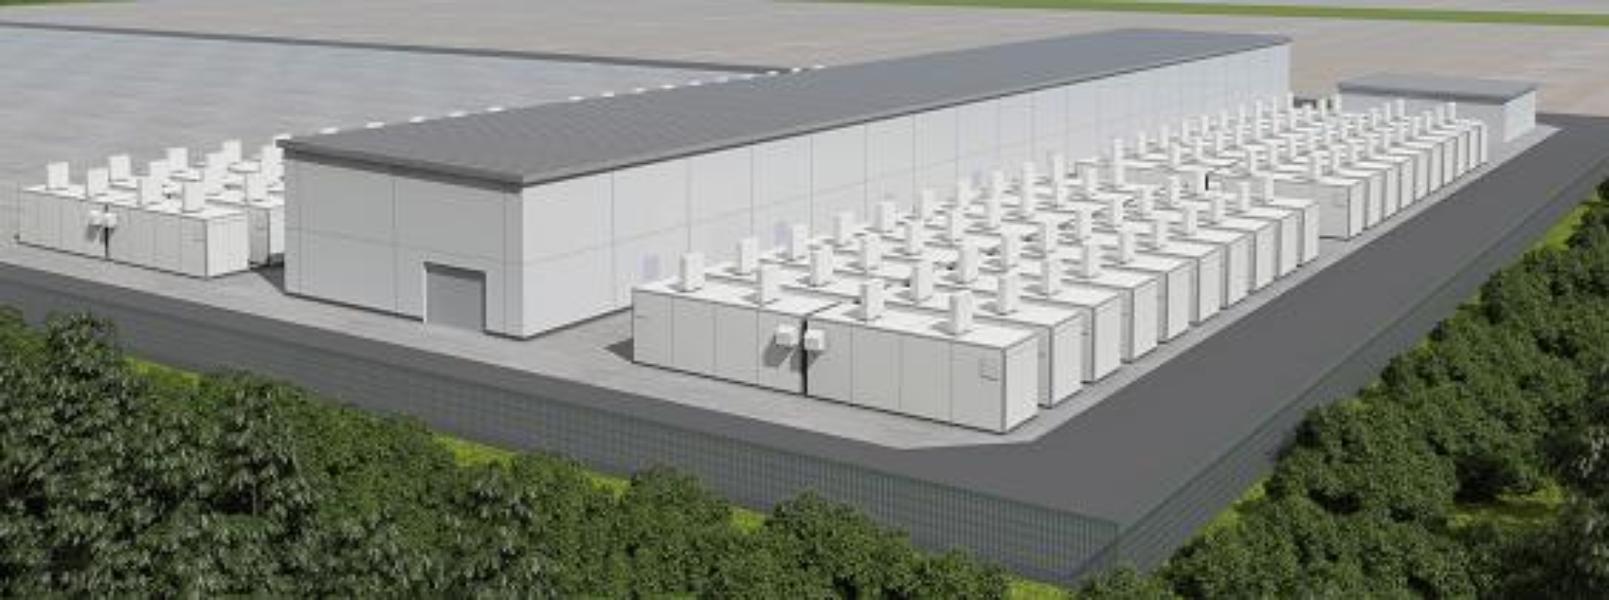 World's Biggest Batteries: Sendai Substation Lithium Ion ...